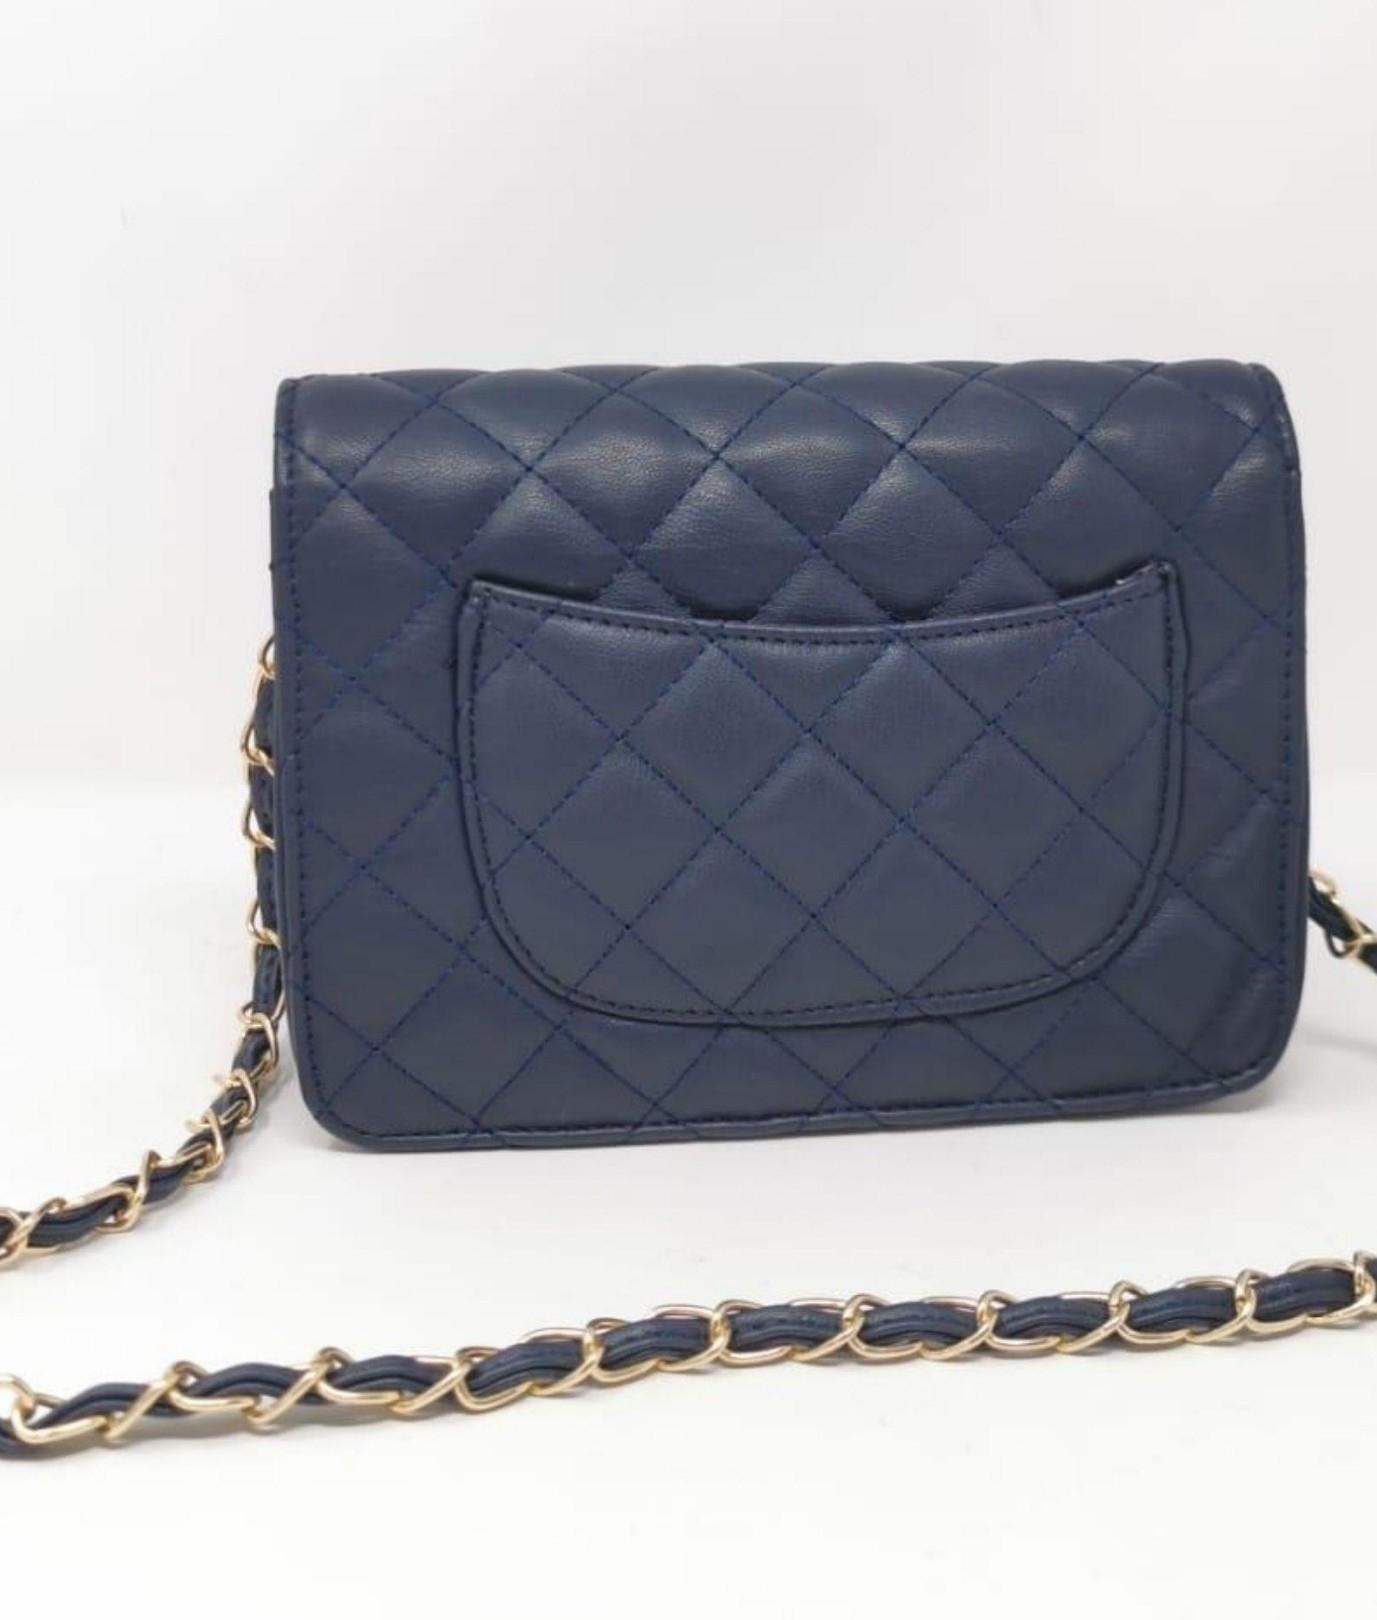 Ainy bolsa de ombro - azul marinho